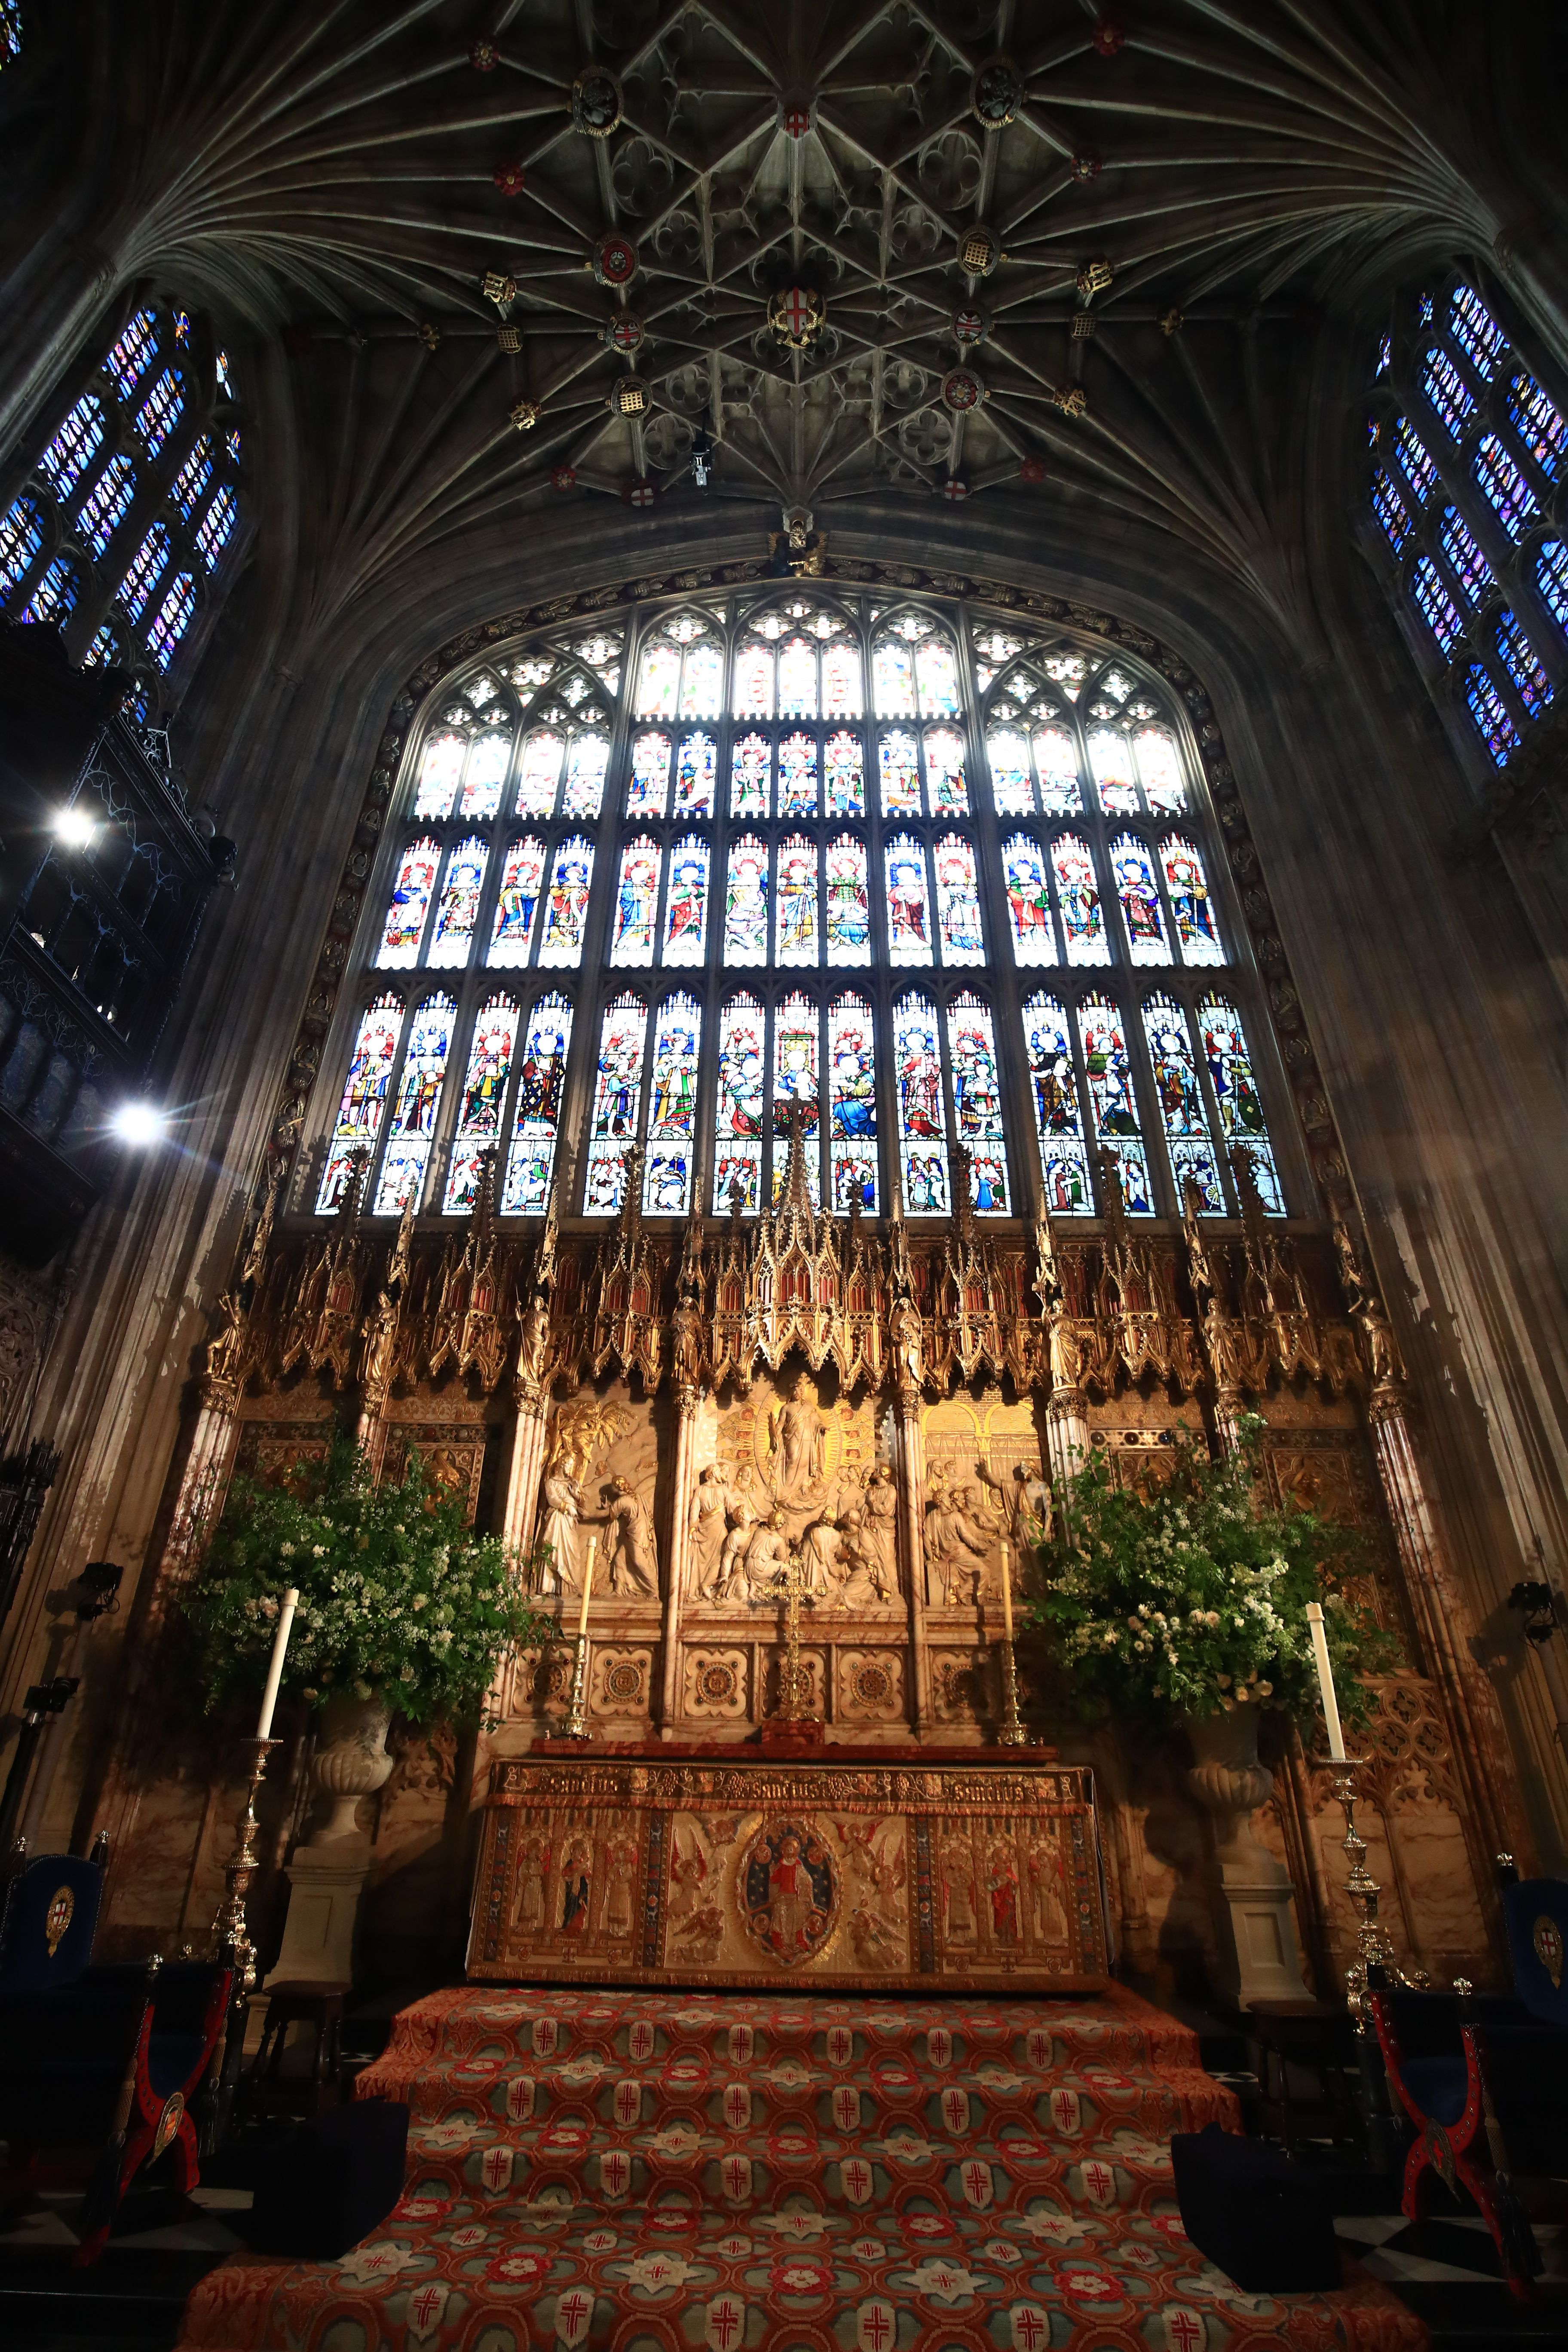 Royal Wedding Flowers Altar